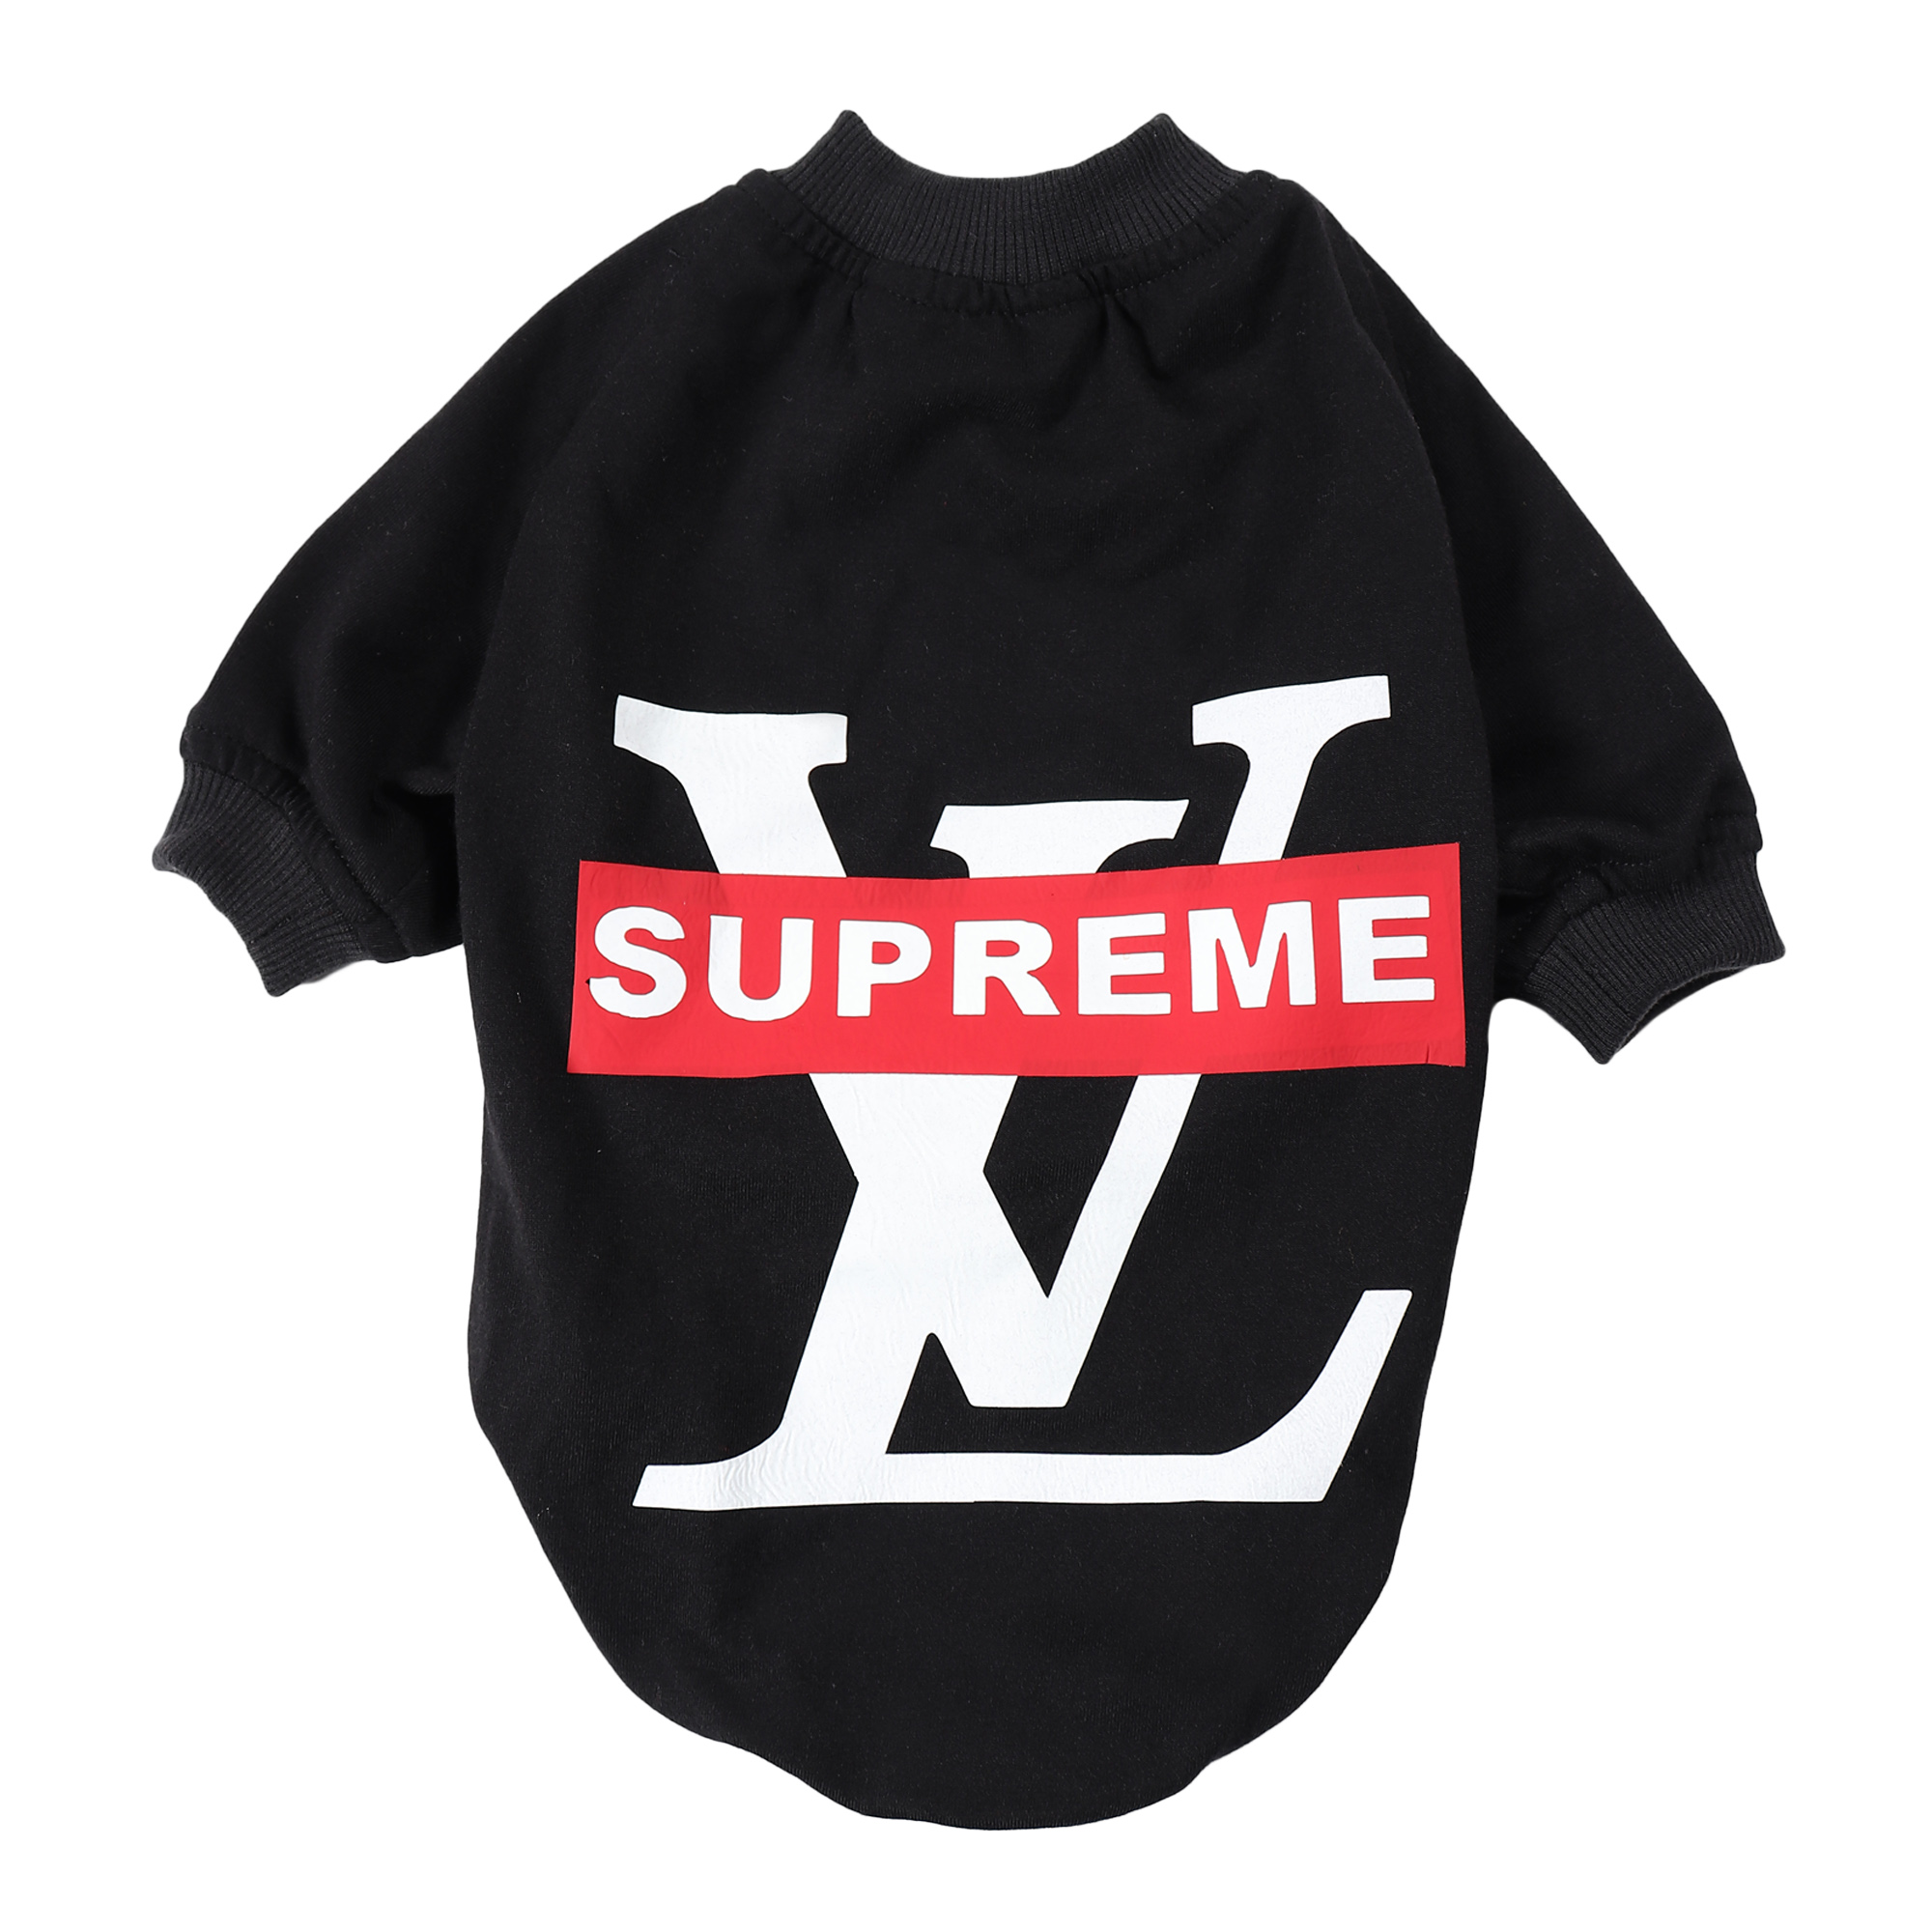 douge couture black printed colour cotton summer T-Shirt lv supreme